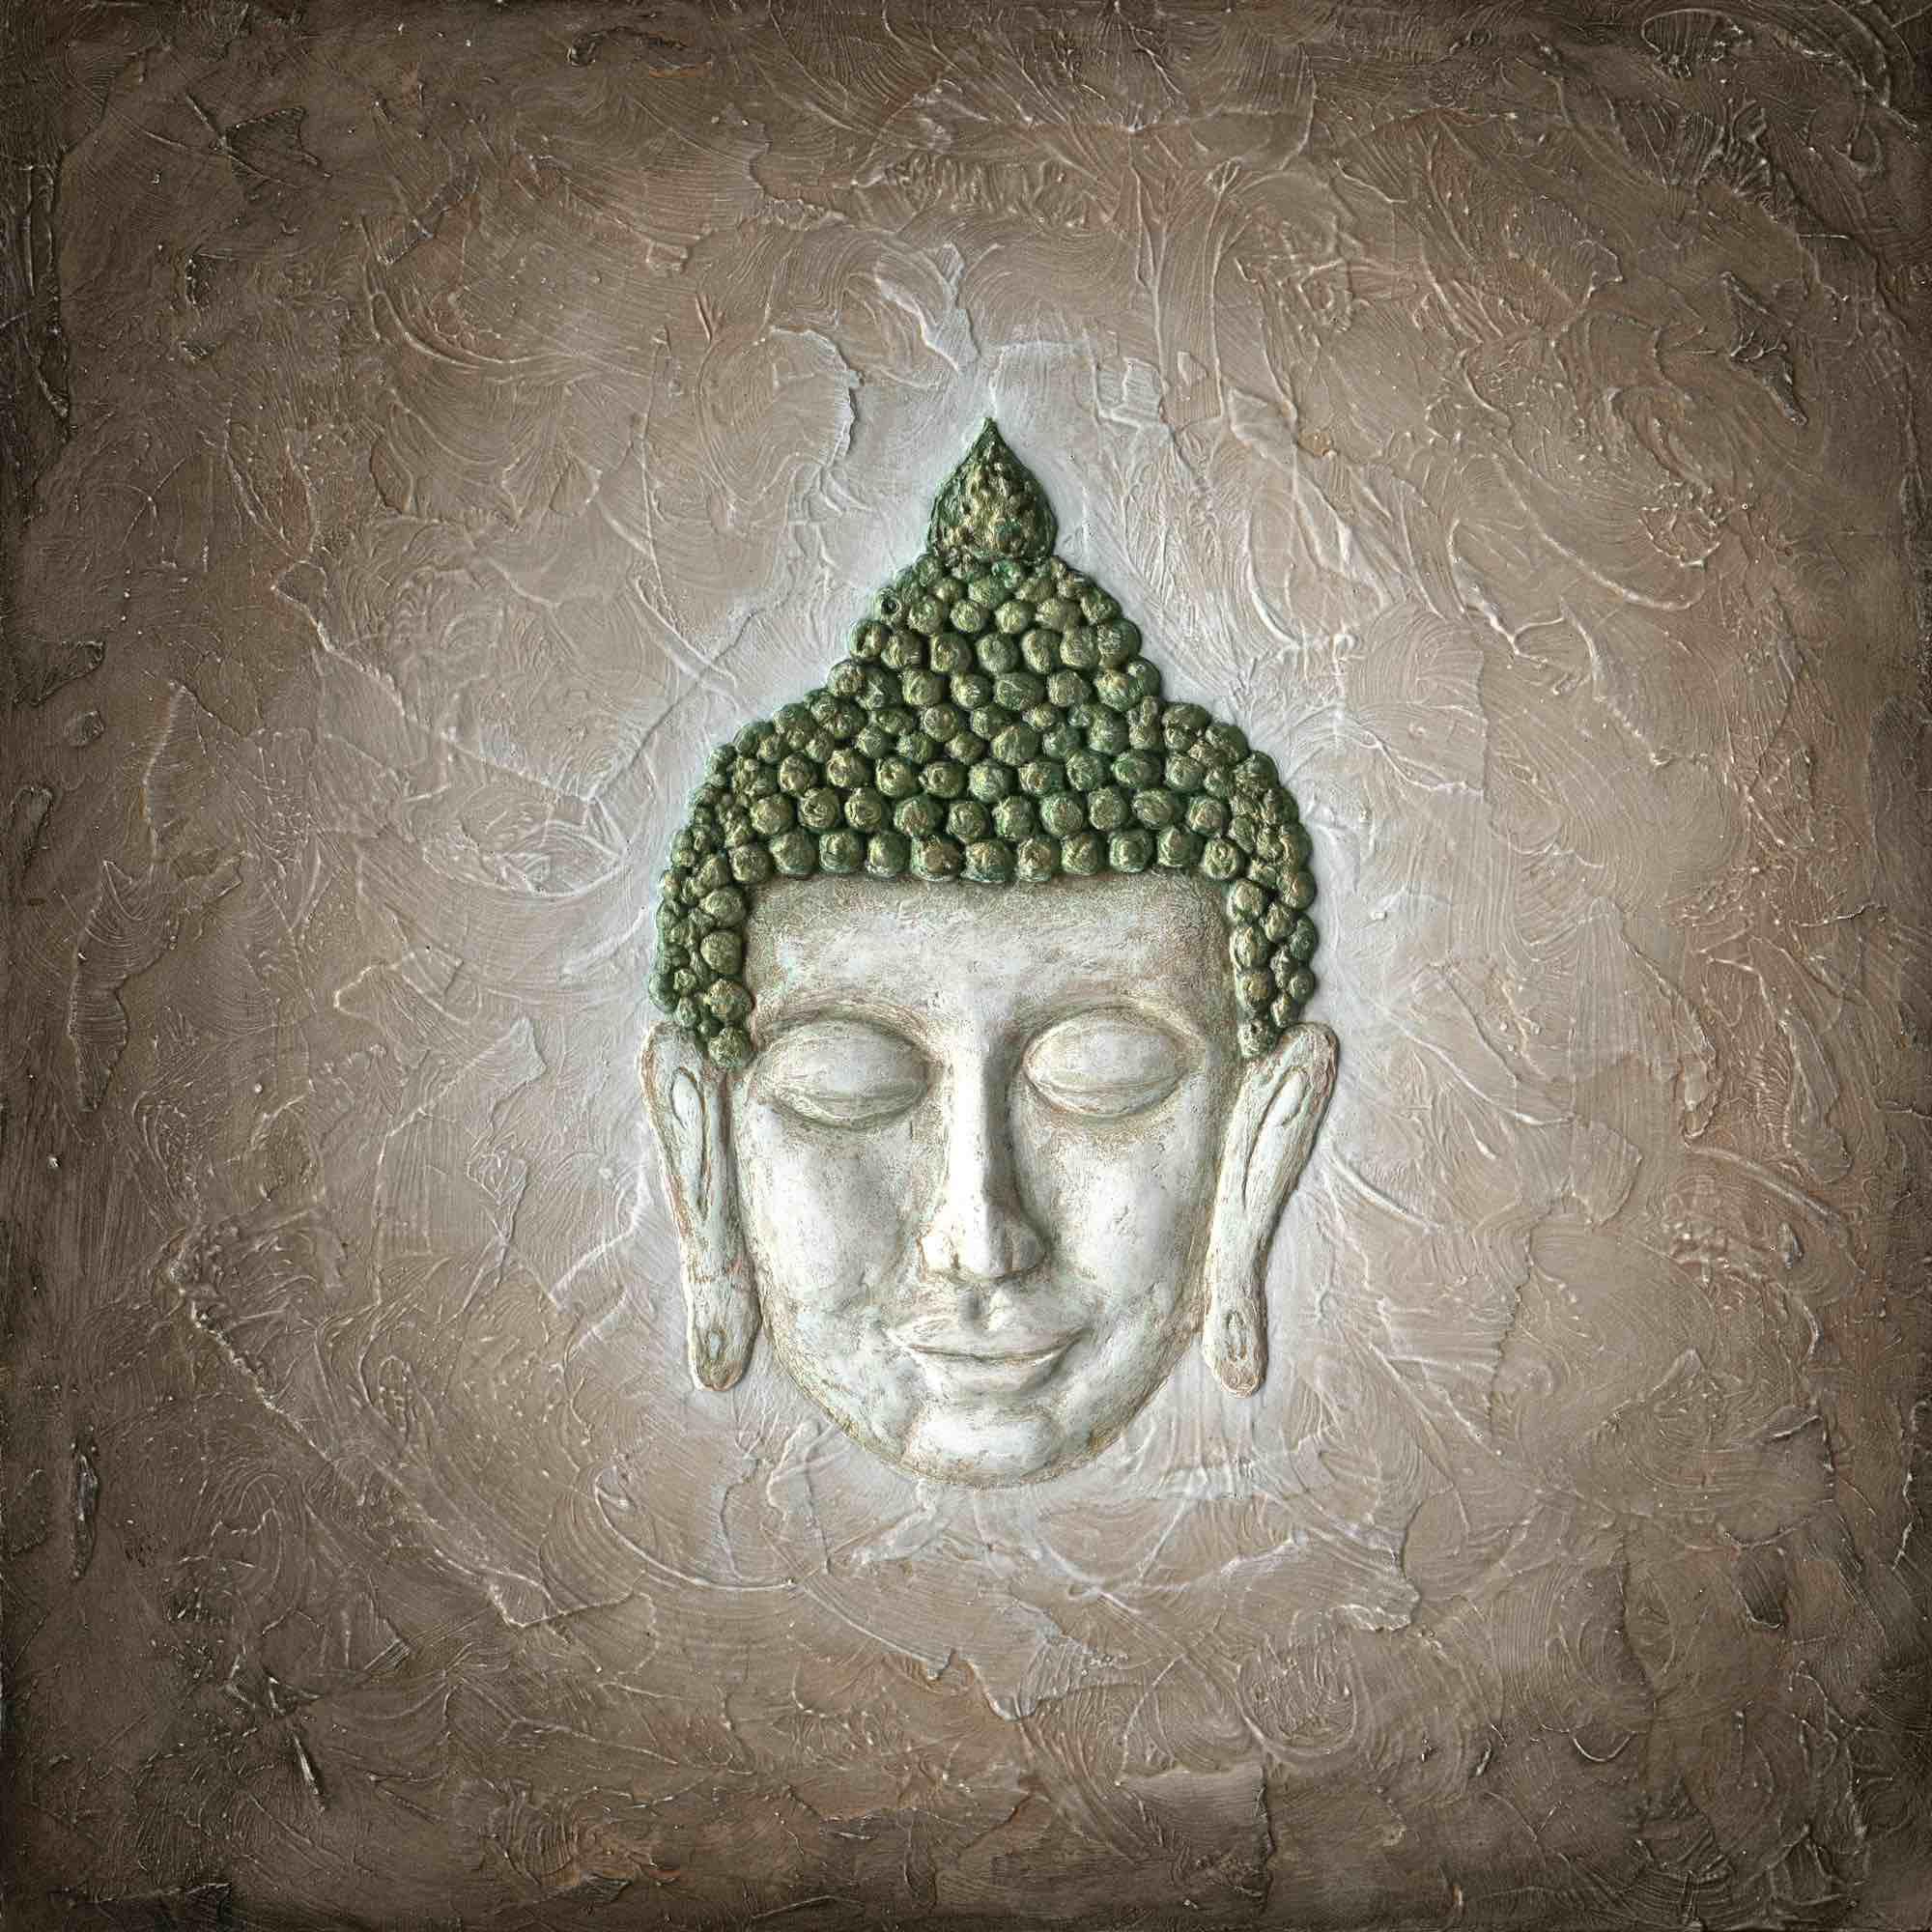 Leinwanddruck - Ruhender Buddha